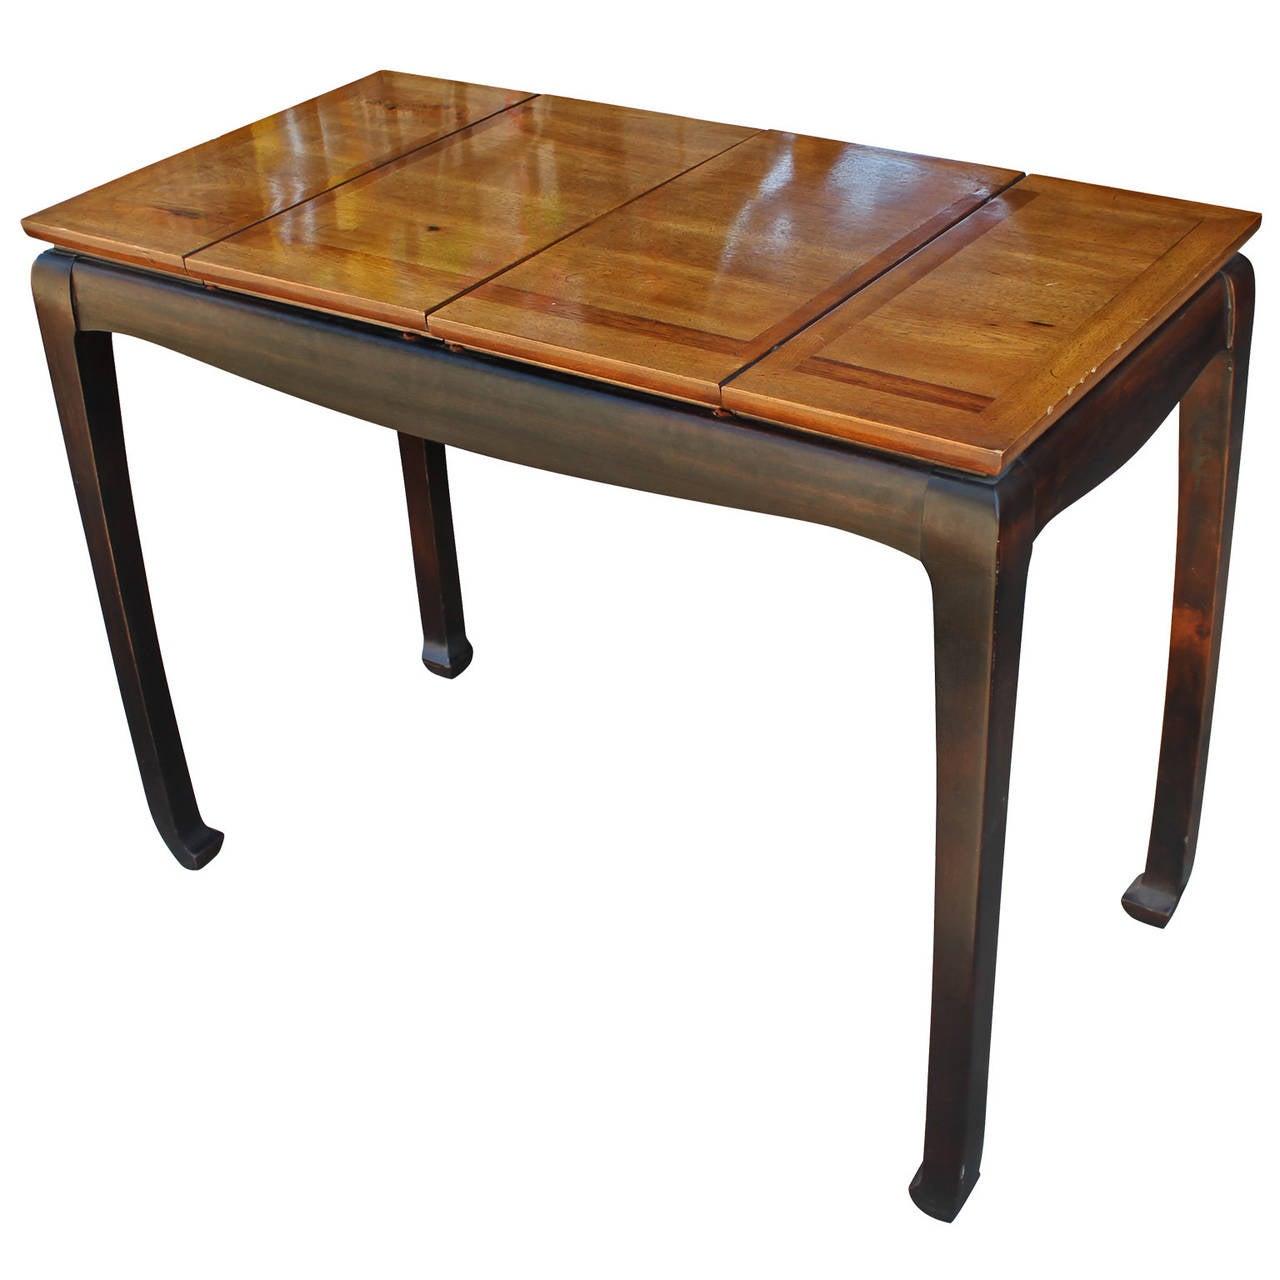 modern walnut backgammon game table at 1stdibs. Black Bedroom Furniture Sets. Home Design Ideas